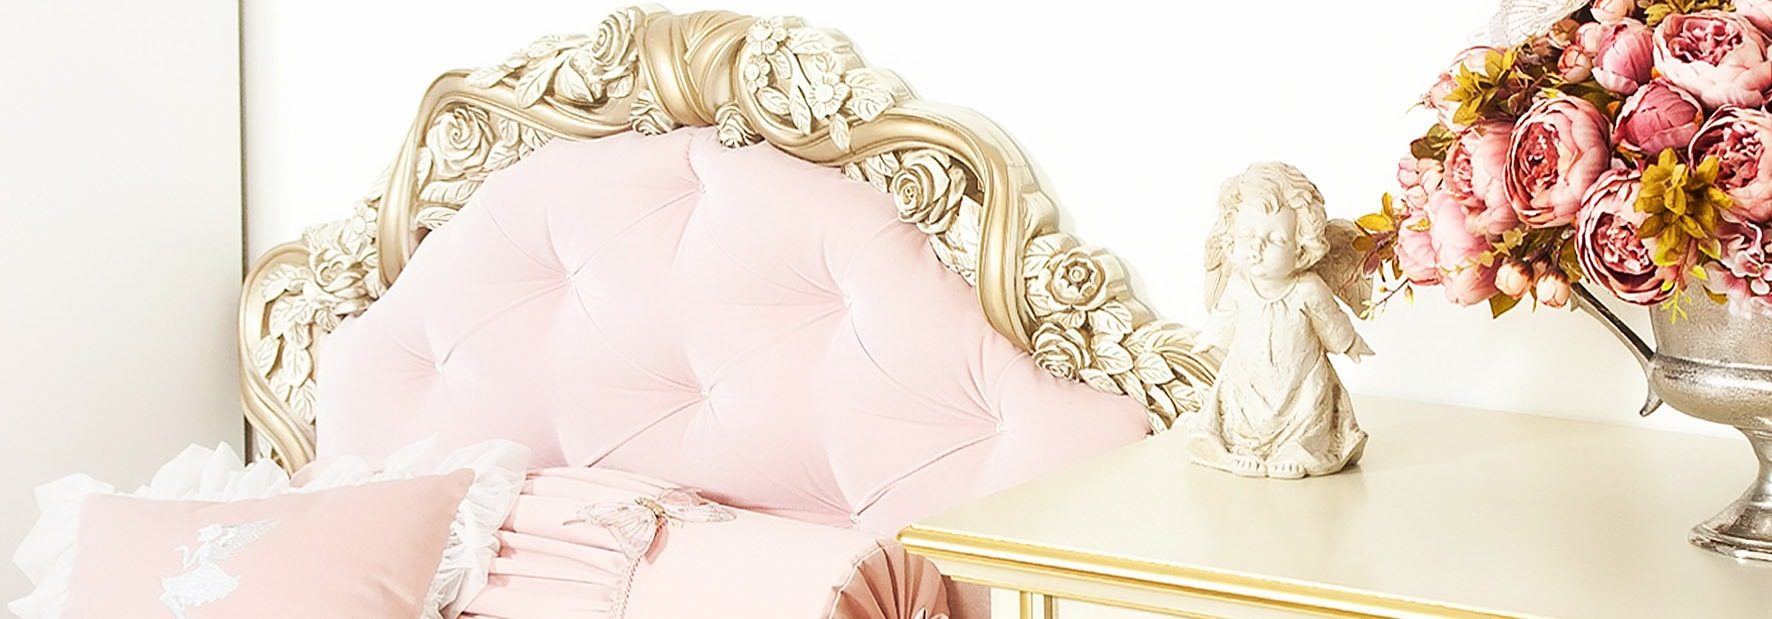 Angelic room мебелирование